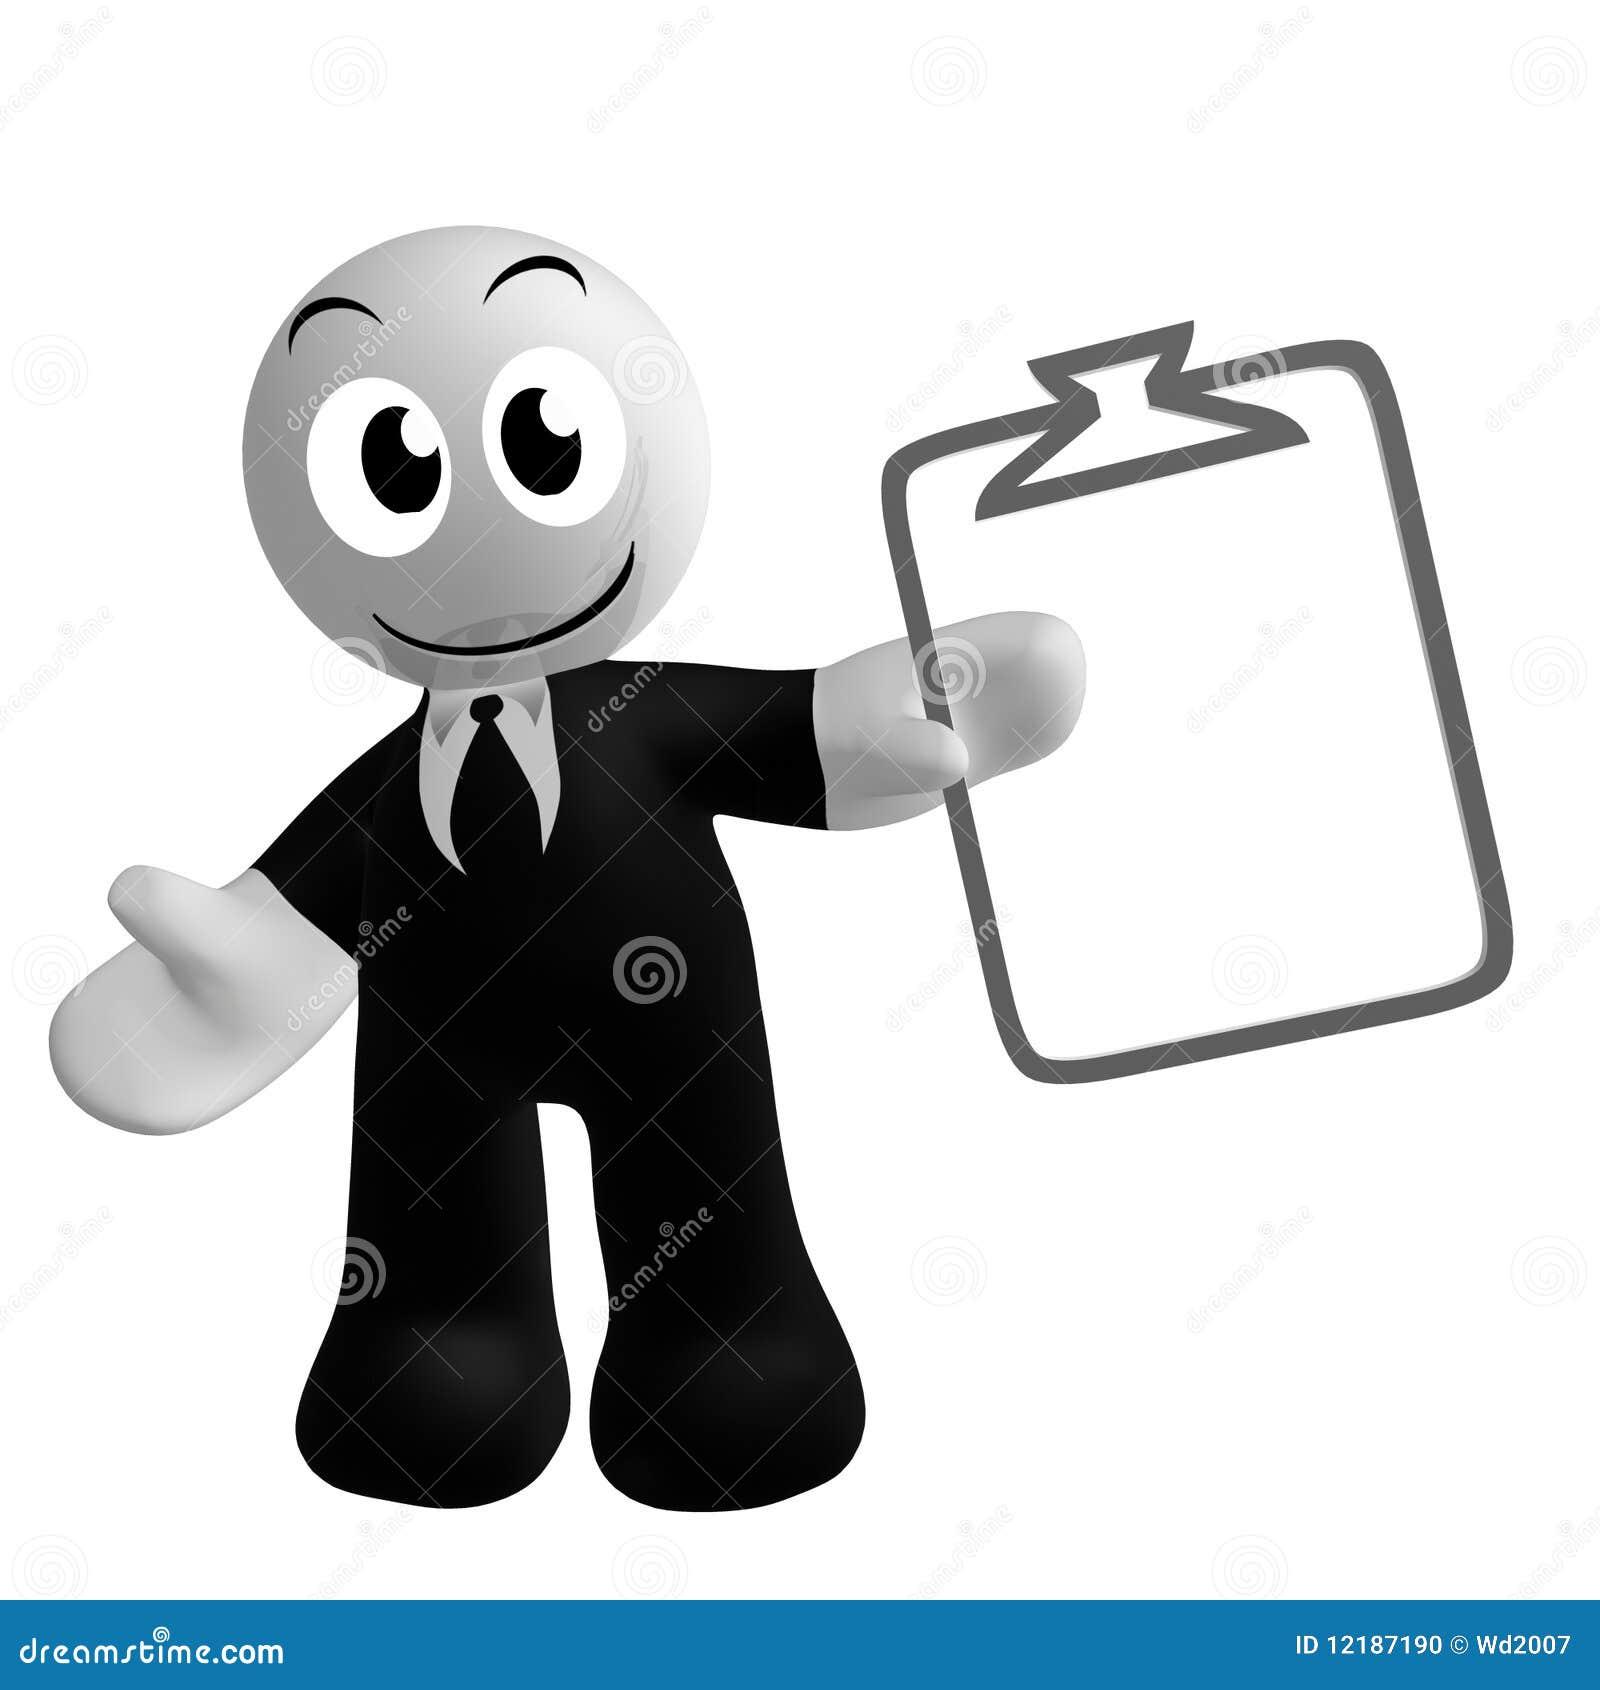 Икона бизнесмена с символом задачи план-графика